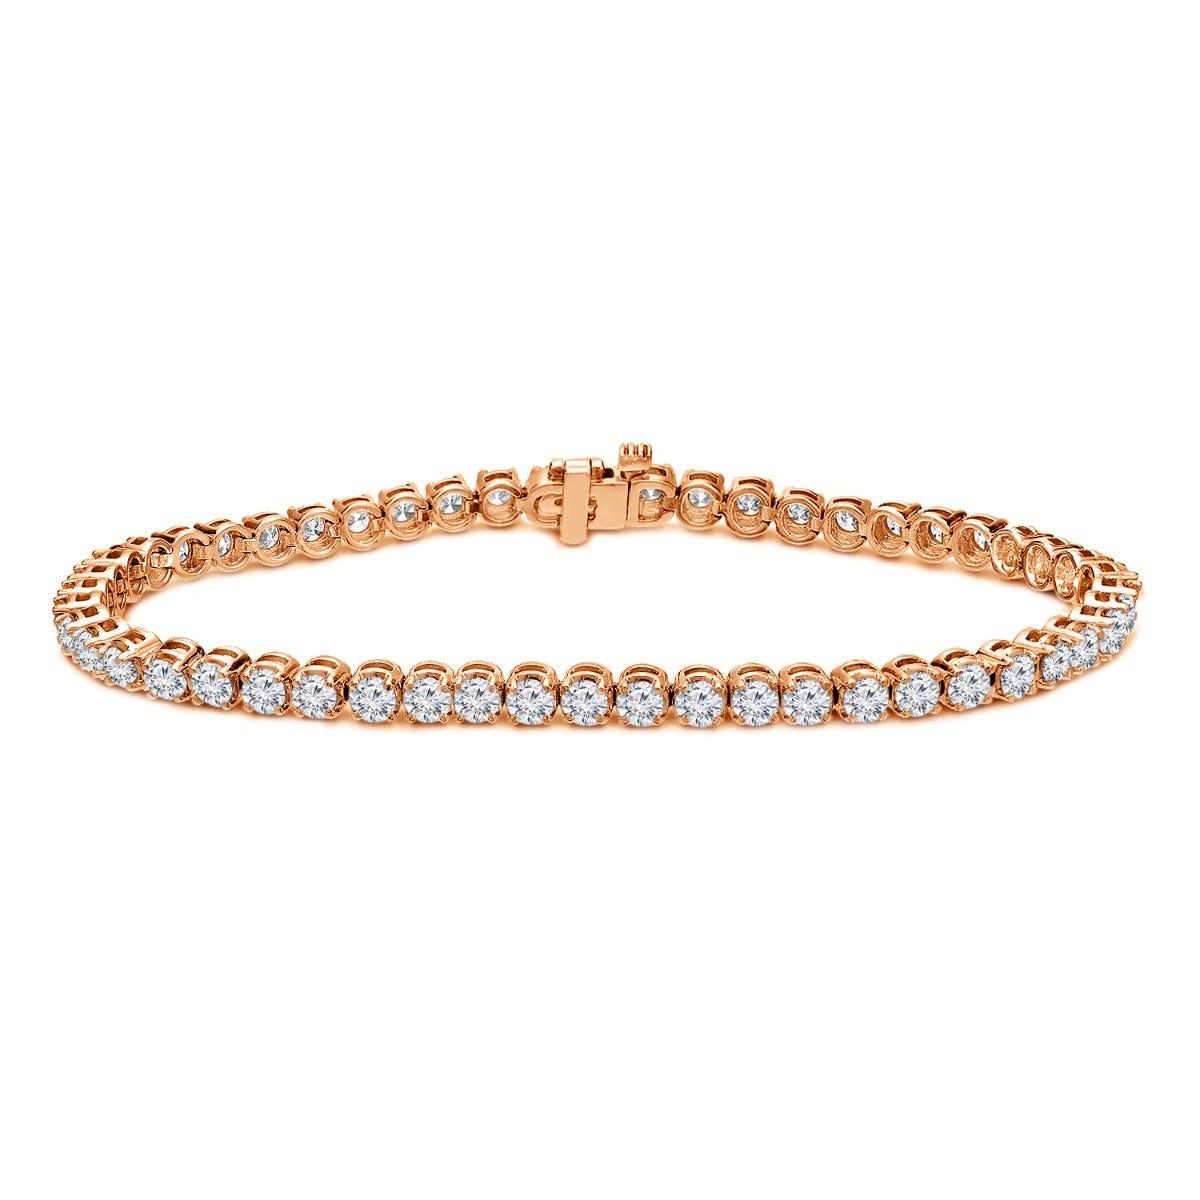 2.50ctw. 4-Prong Round Link Diamond Tennis Bracelet in 14K Rose Gold (HI, SI1-SI2)